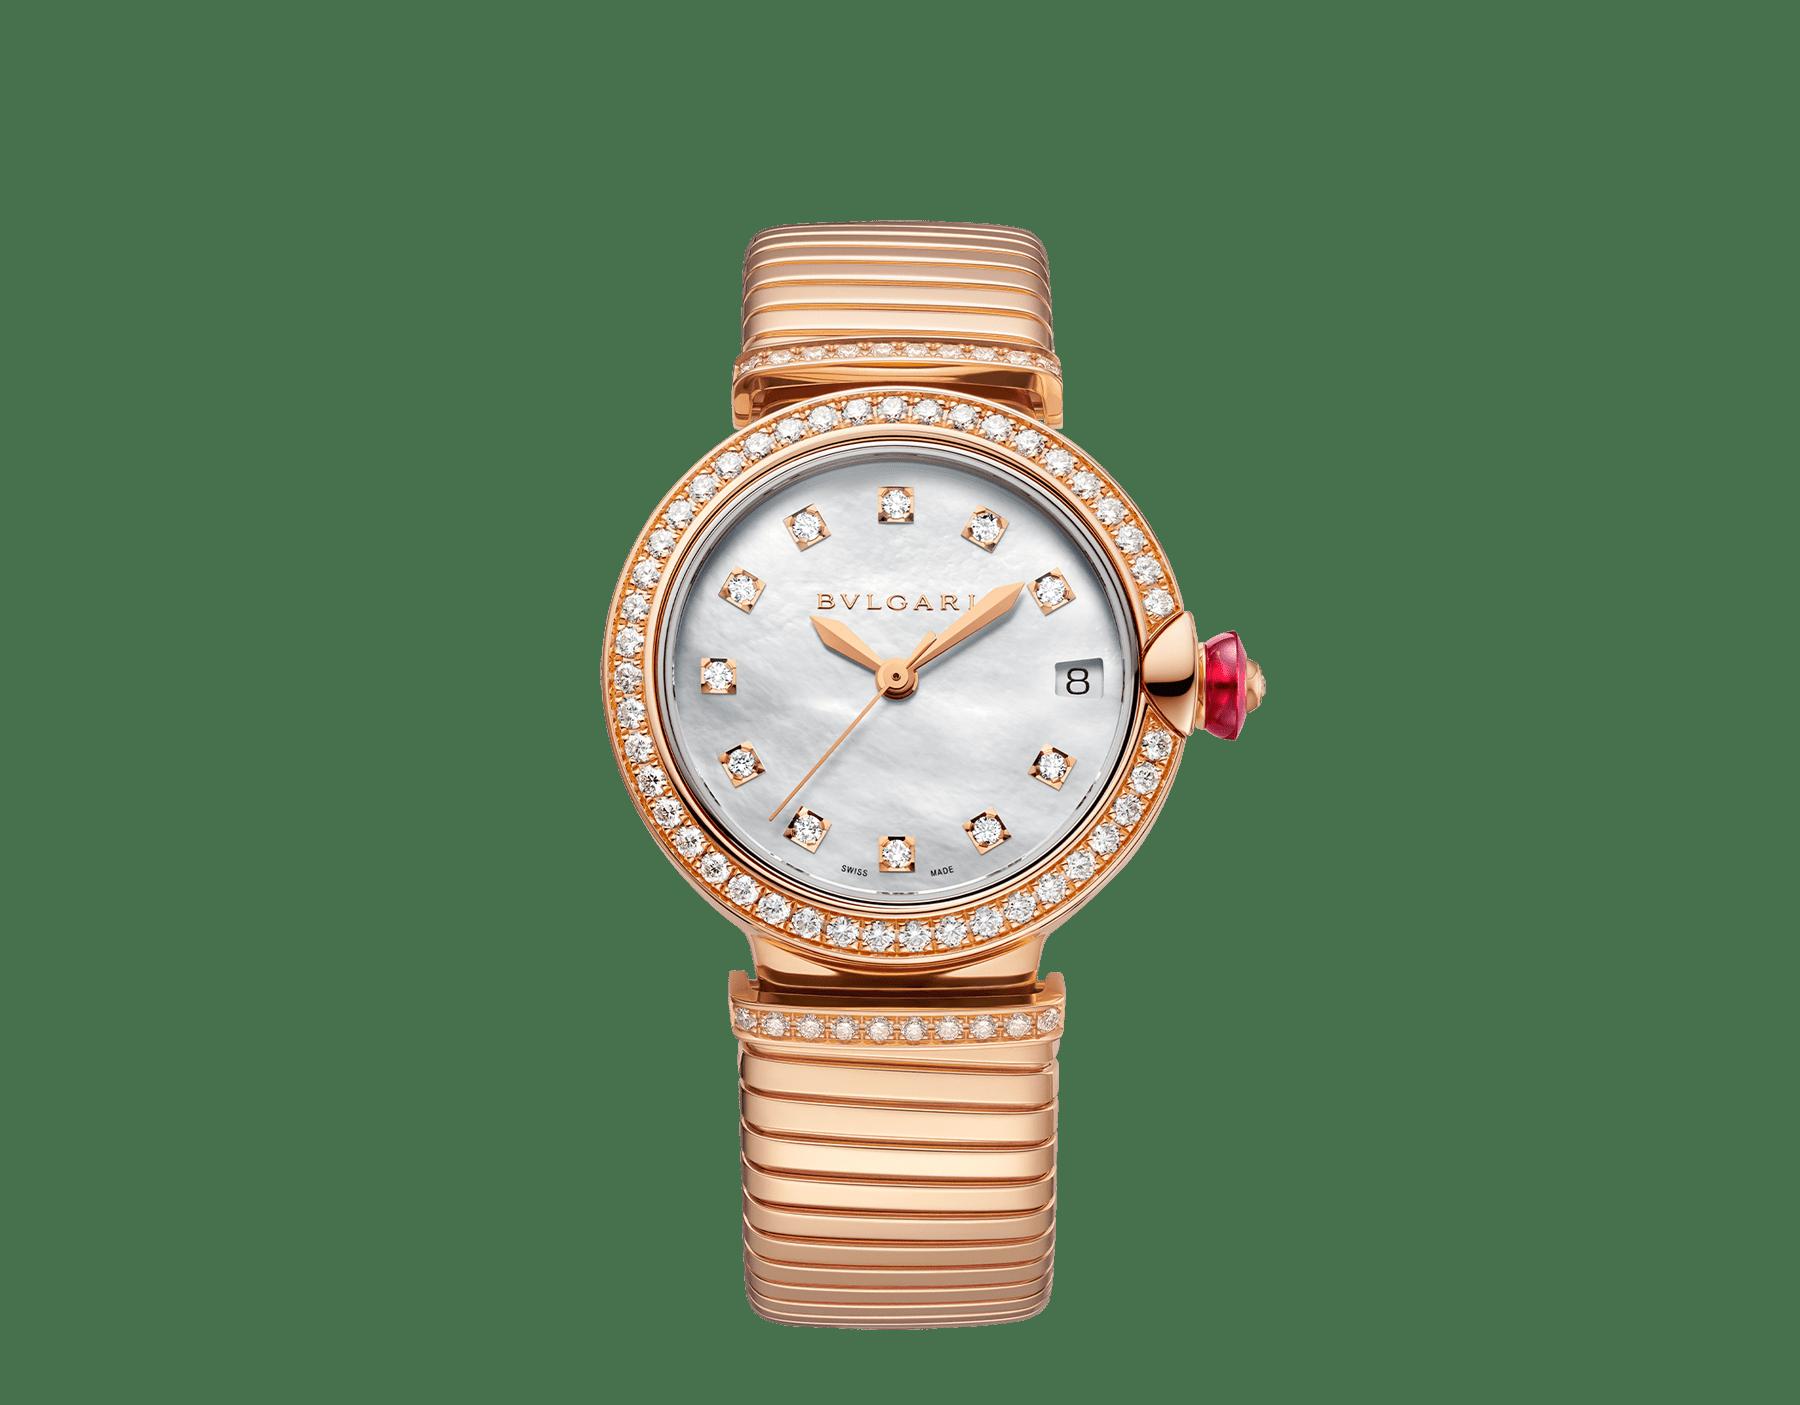 Reloj LVCEA Tubogas con caja en oro rosa de 18qt con diamantes engastados, esfera de madreperla blanca, diamantes engastados como índices y brazalete tubogas en oro rosa de 18qt. 103034 image 1